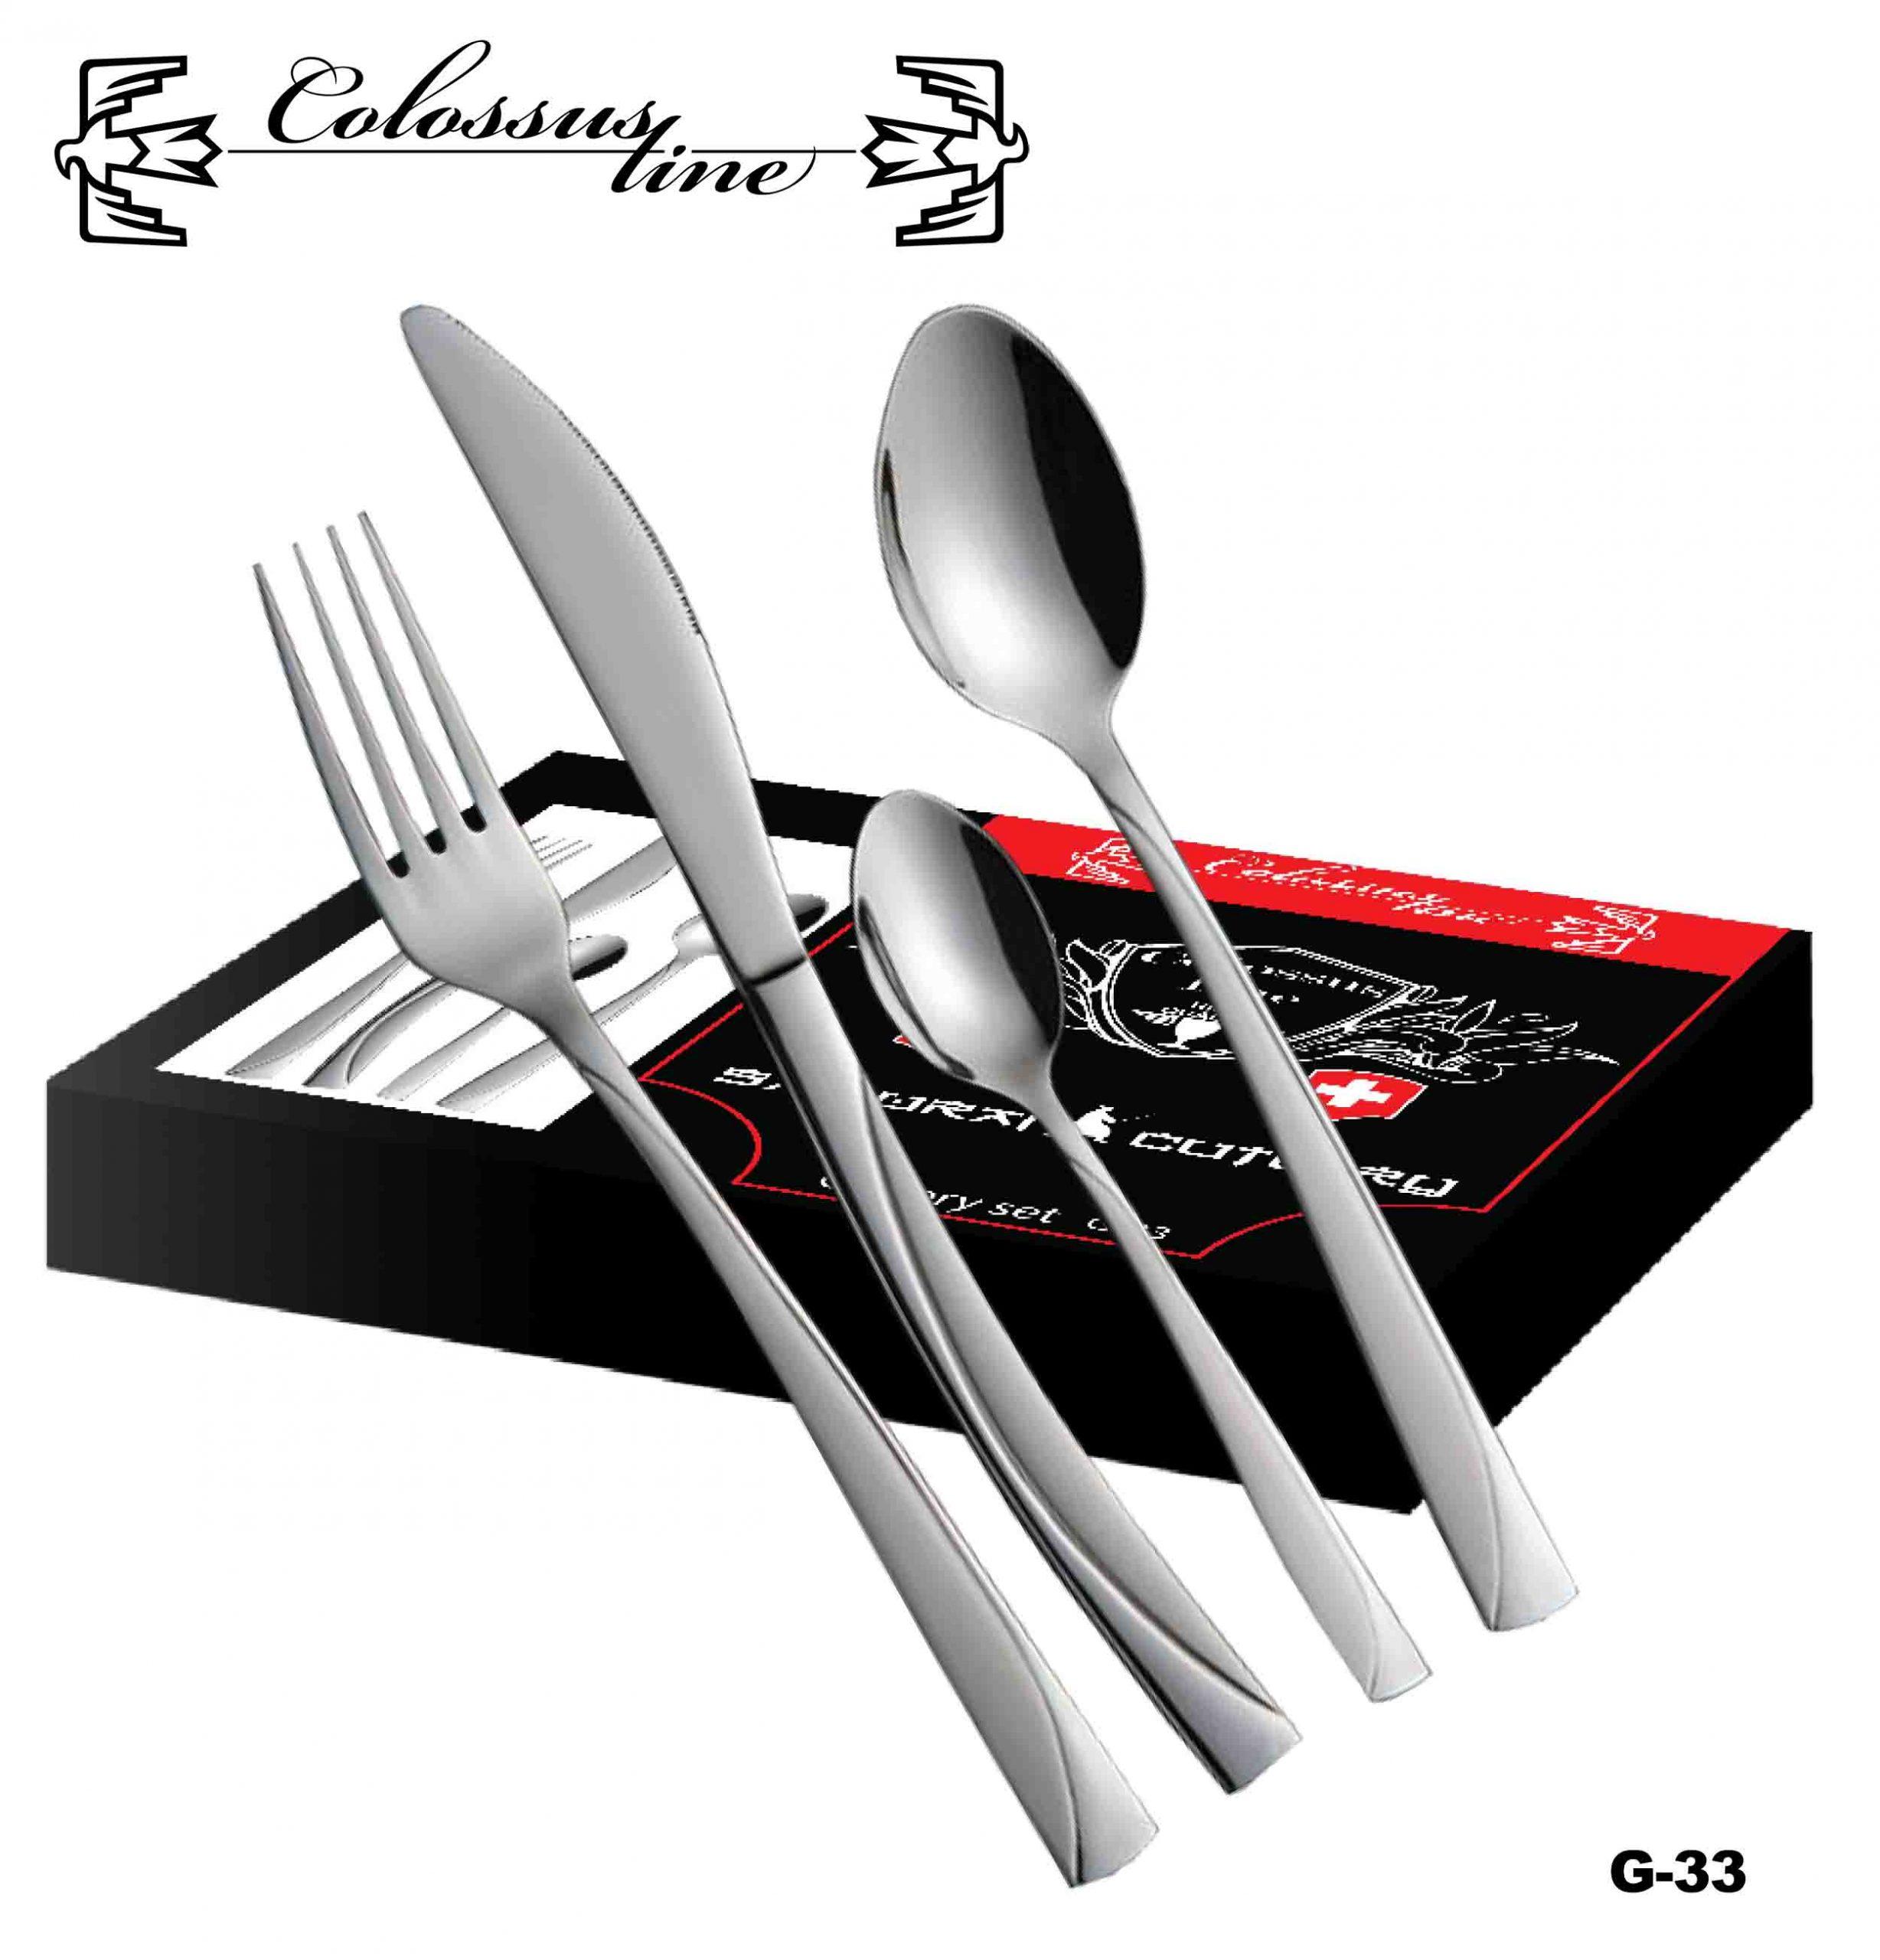 Exkluzivni escajg set 24pcs Colossus line Gently G-33